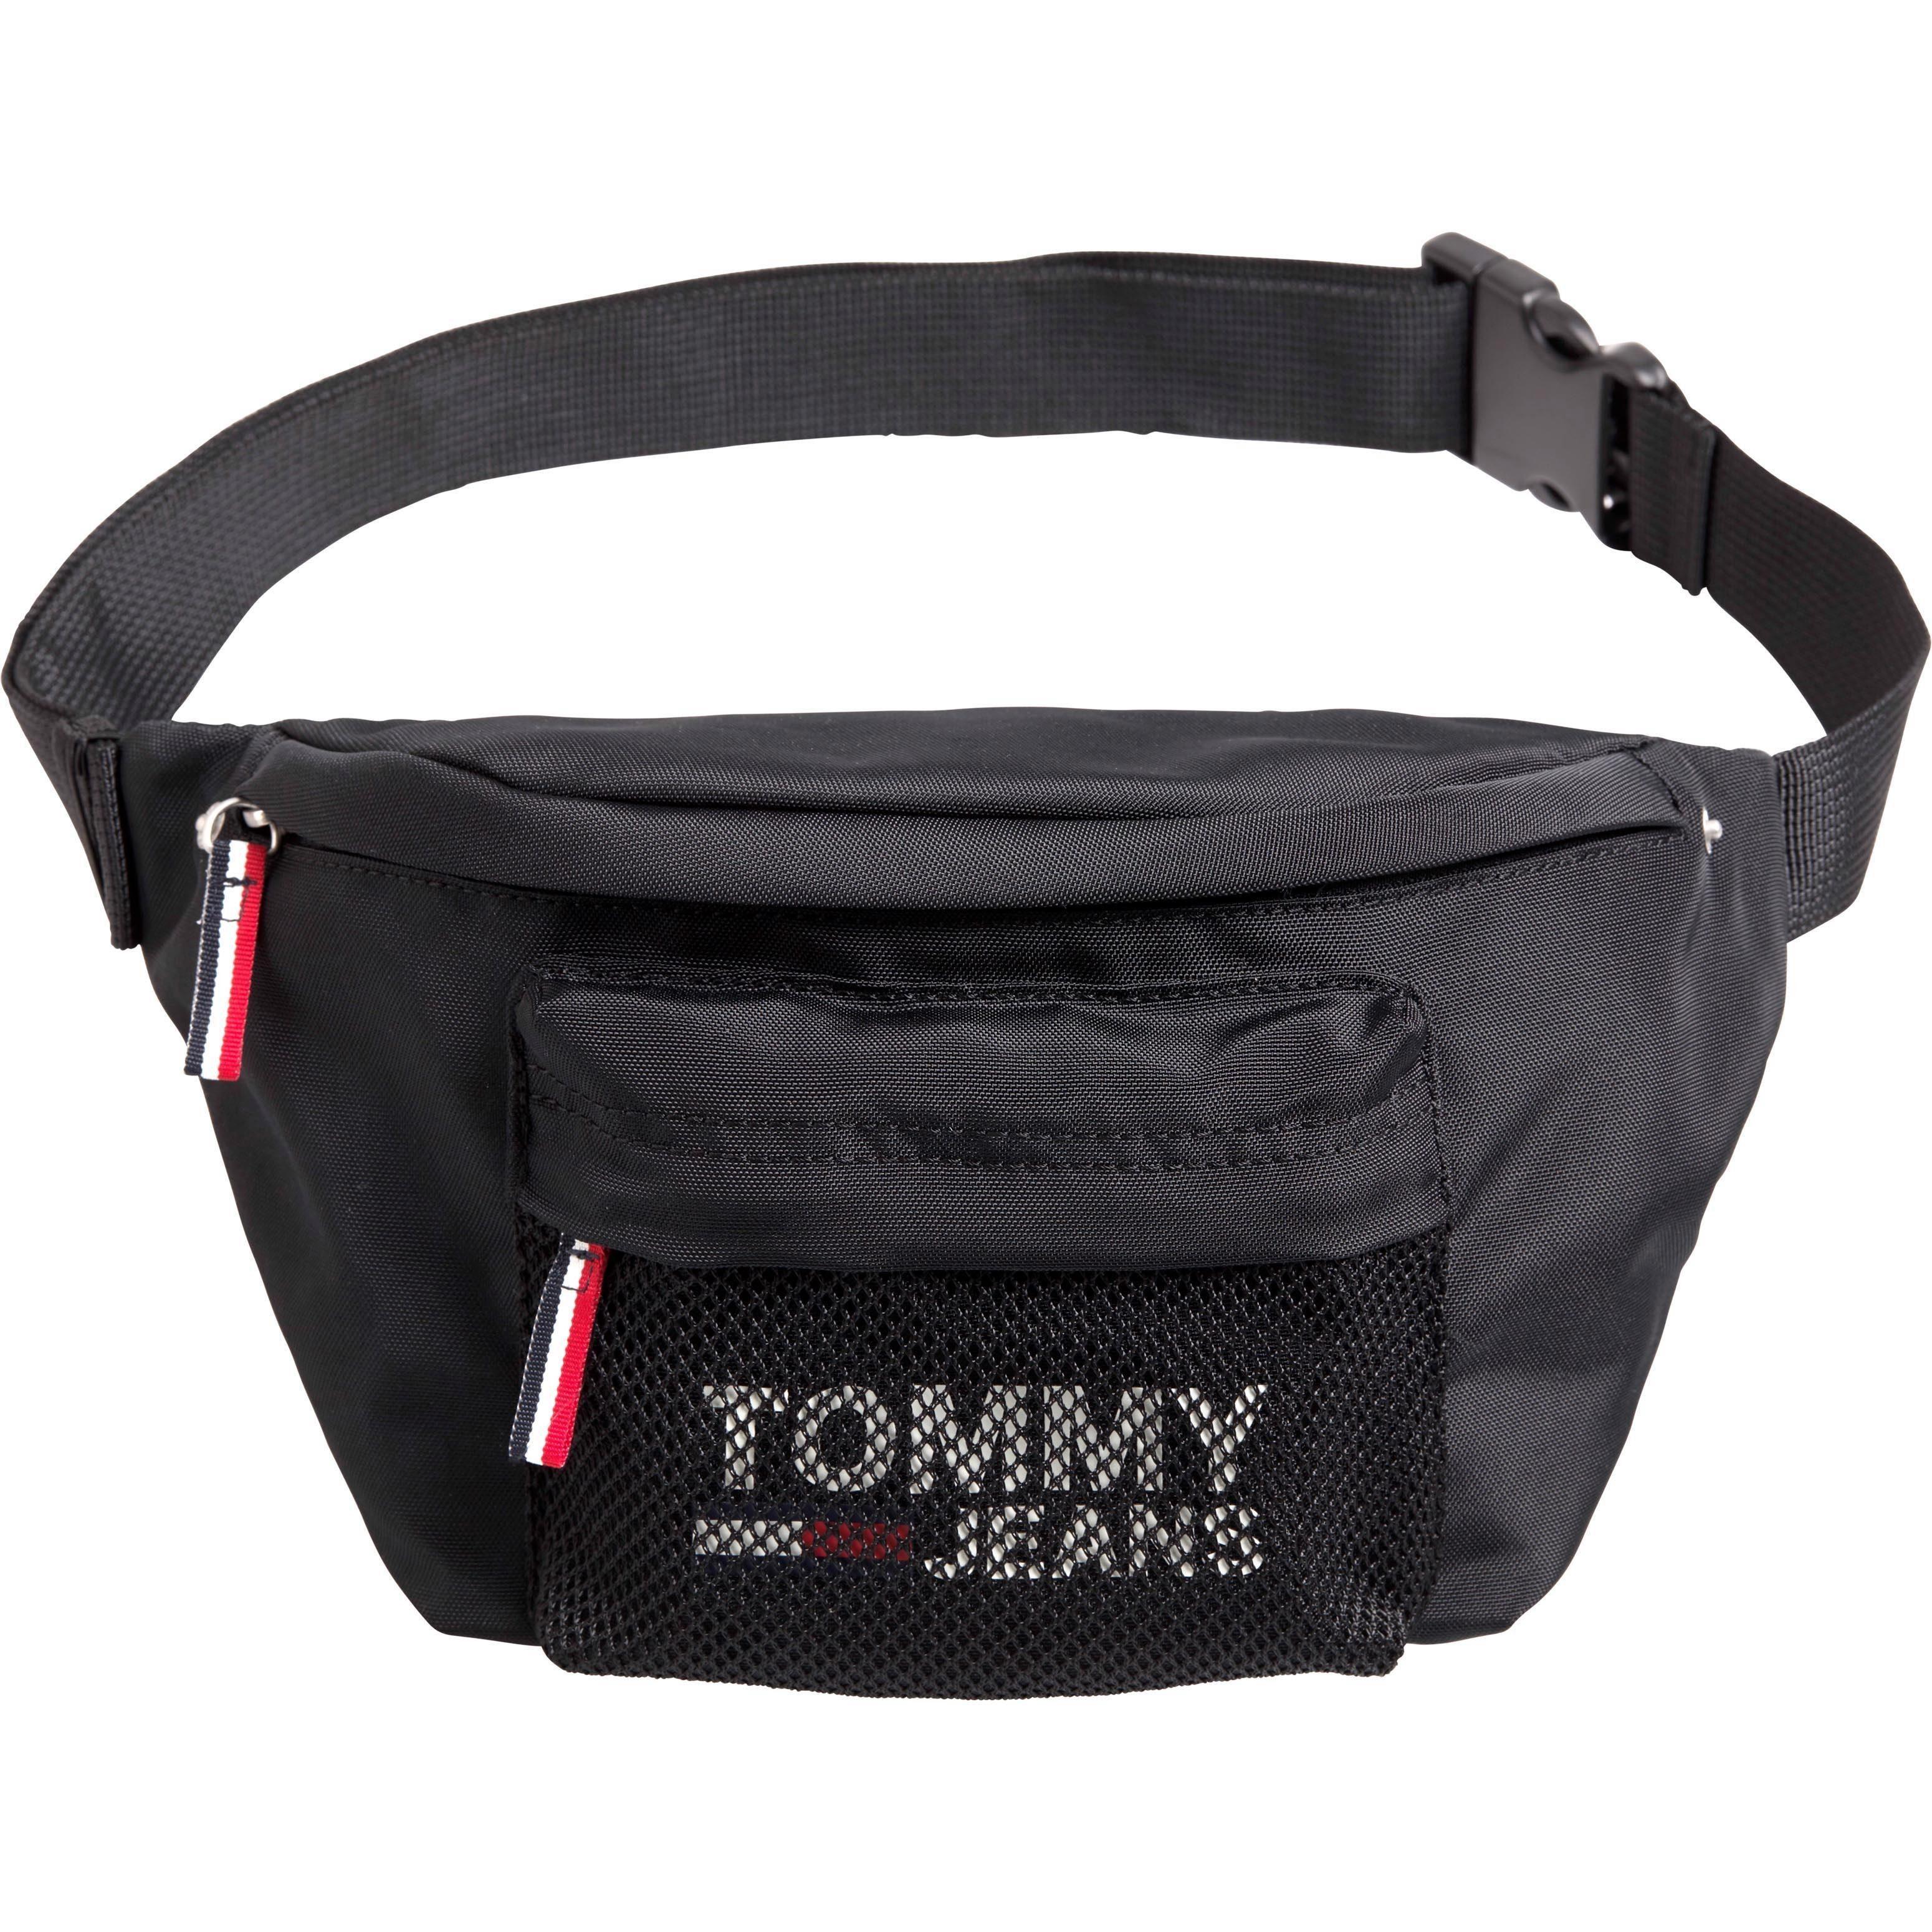 TOMMY JEANS Gürteltasche TJM COOL CITY BUMBAG | Taschen > Gürteltaschen | Tommy Jeans